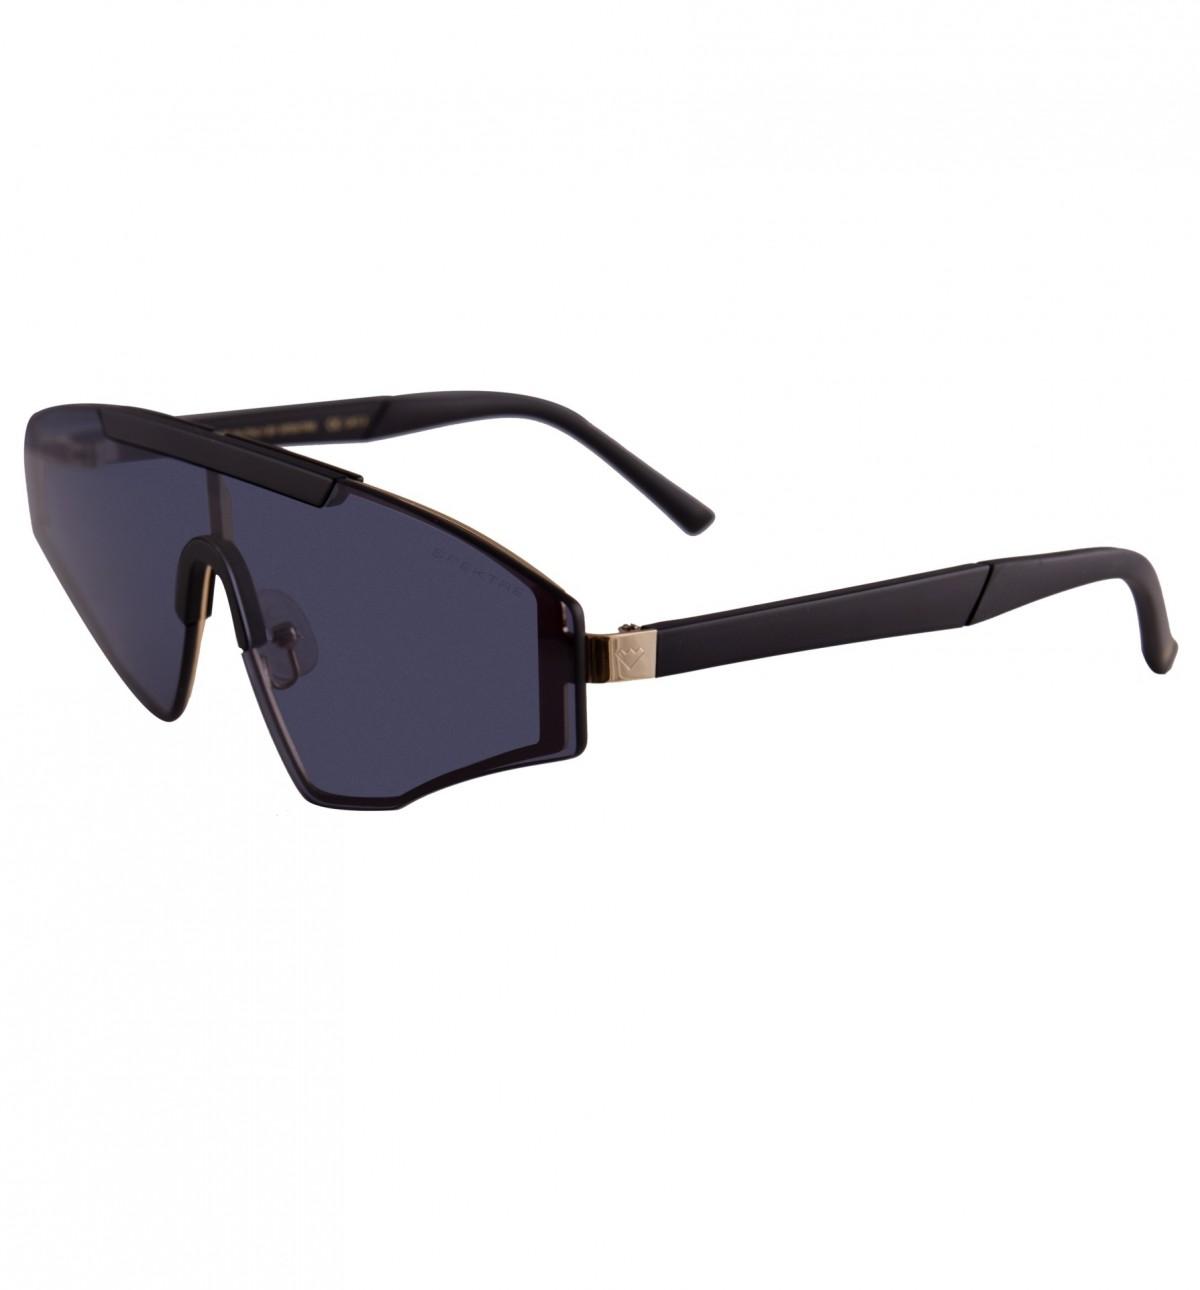 Spektre Vincent nero, 120,00€, Occhiali Spektre Nero a forma Mascherina